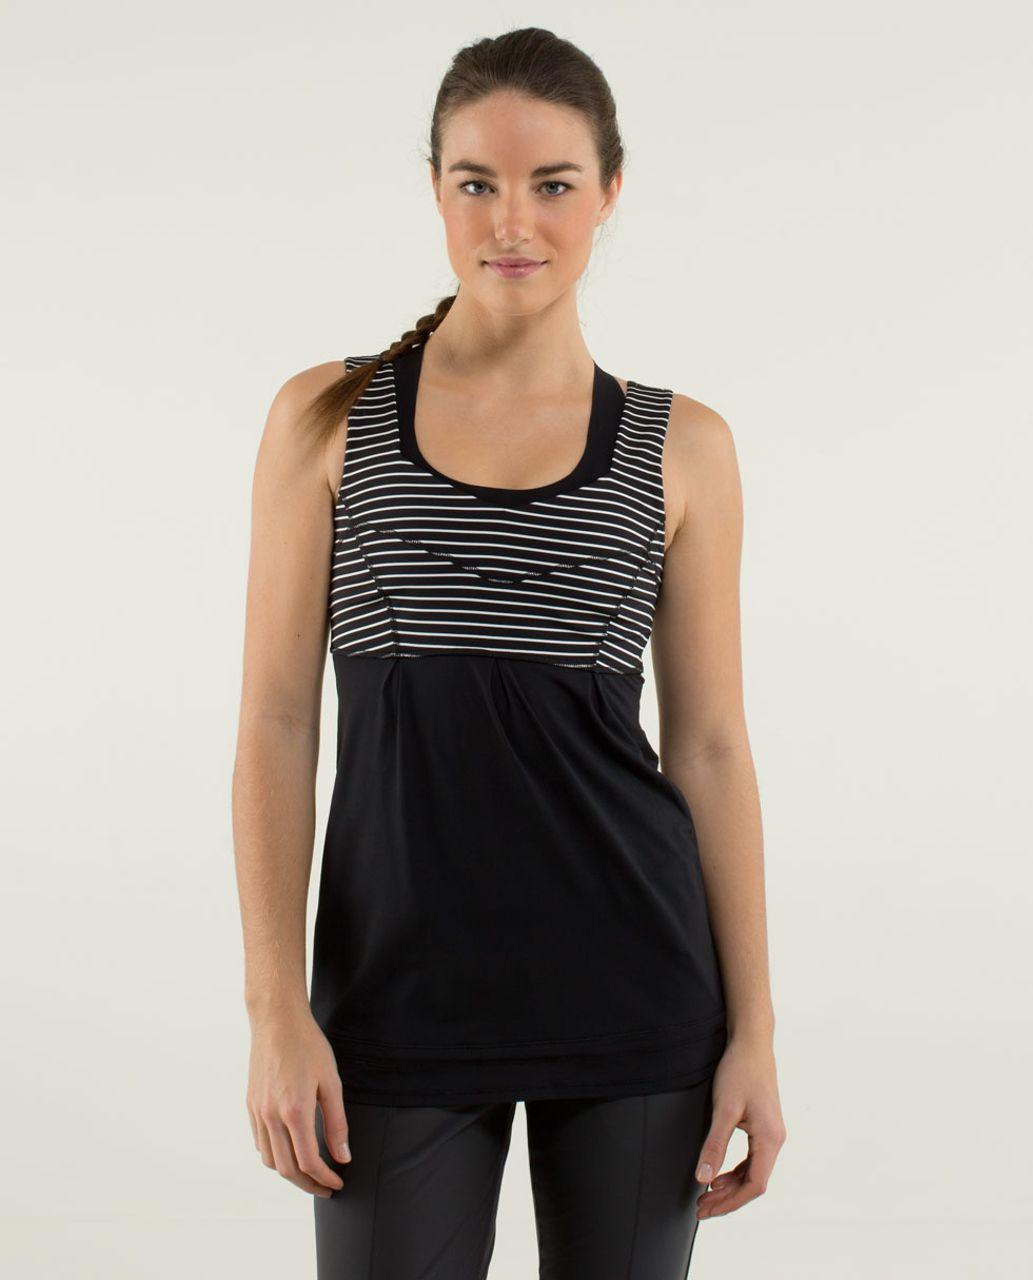 Lululemon Tame Me Tank - Black / Parallel Stripe Black White